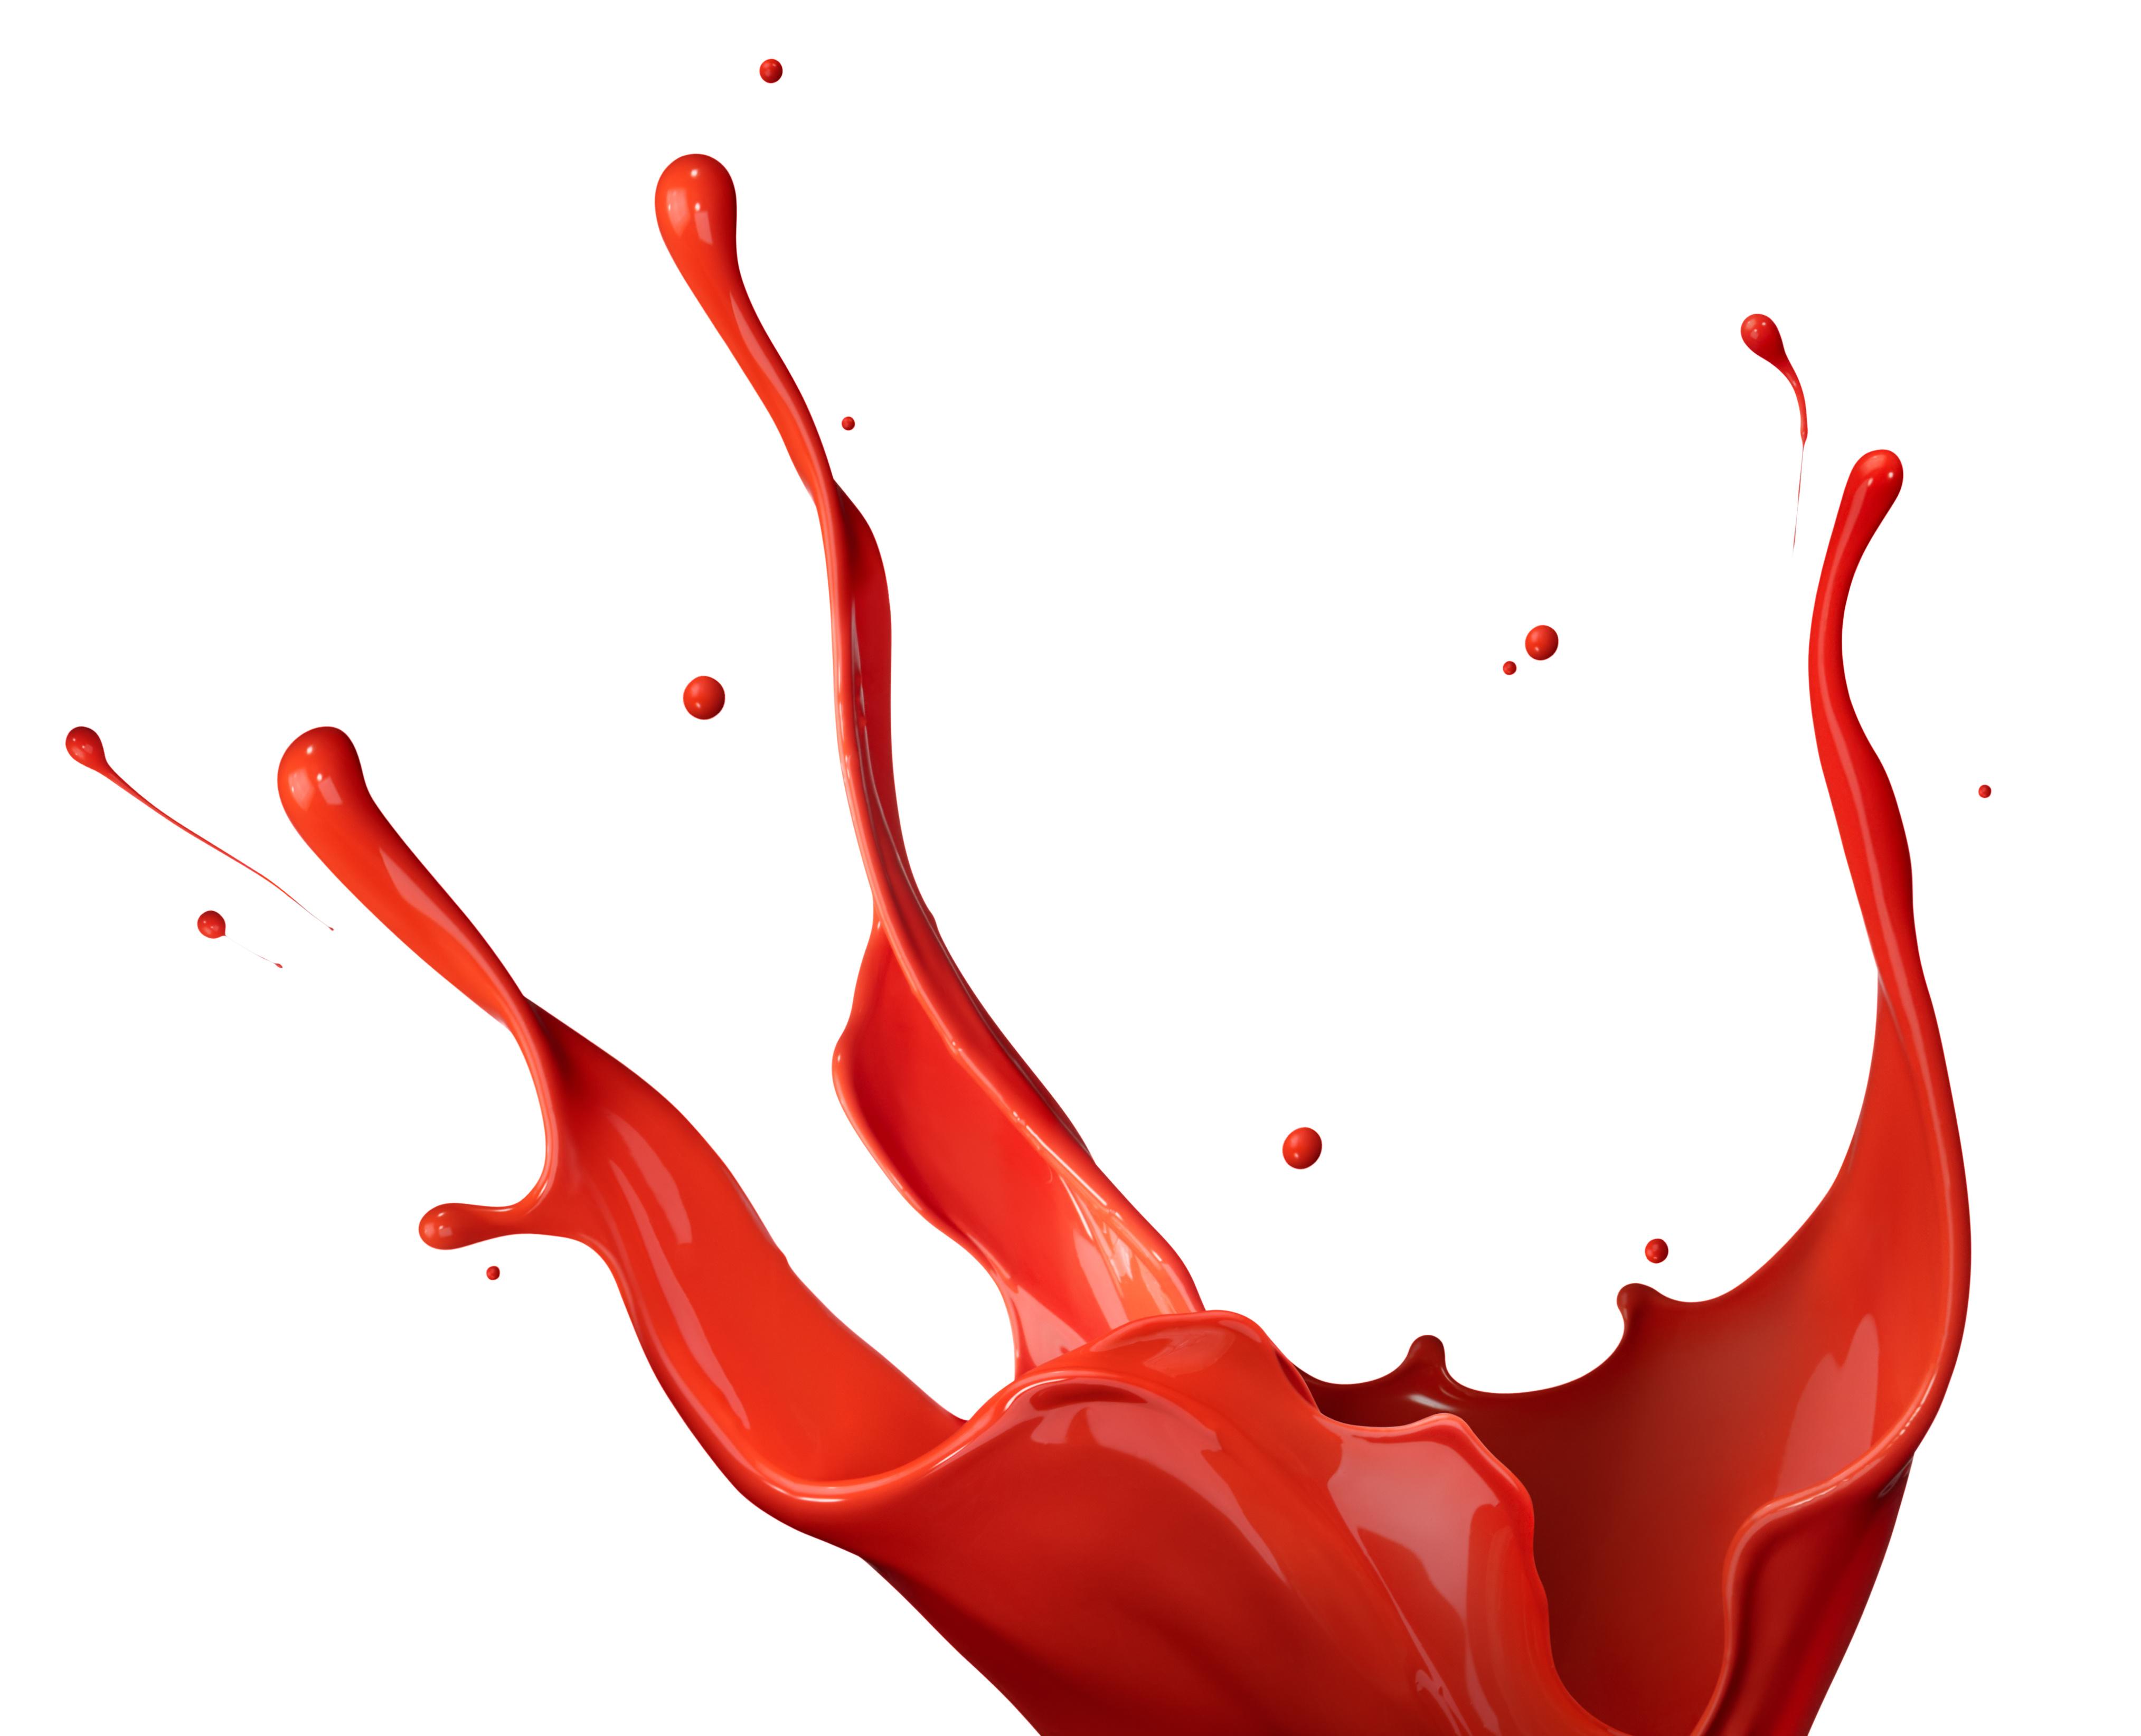 Paint Splash PNG by AbsurdWordPreferred on DeviantArt